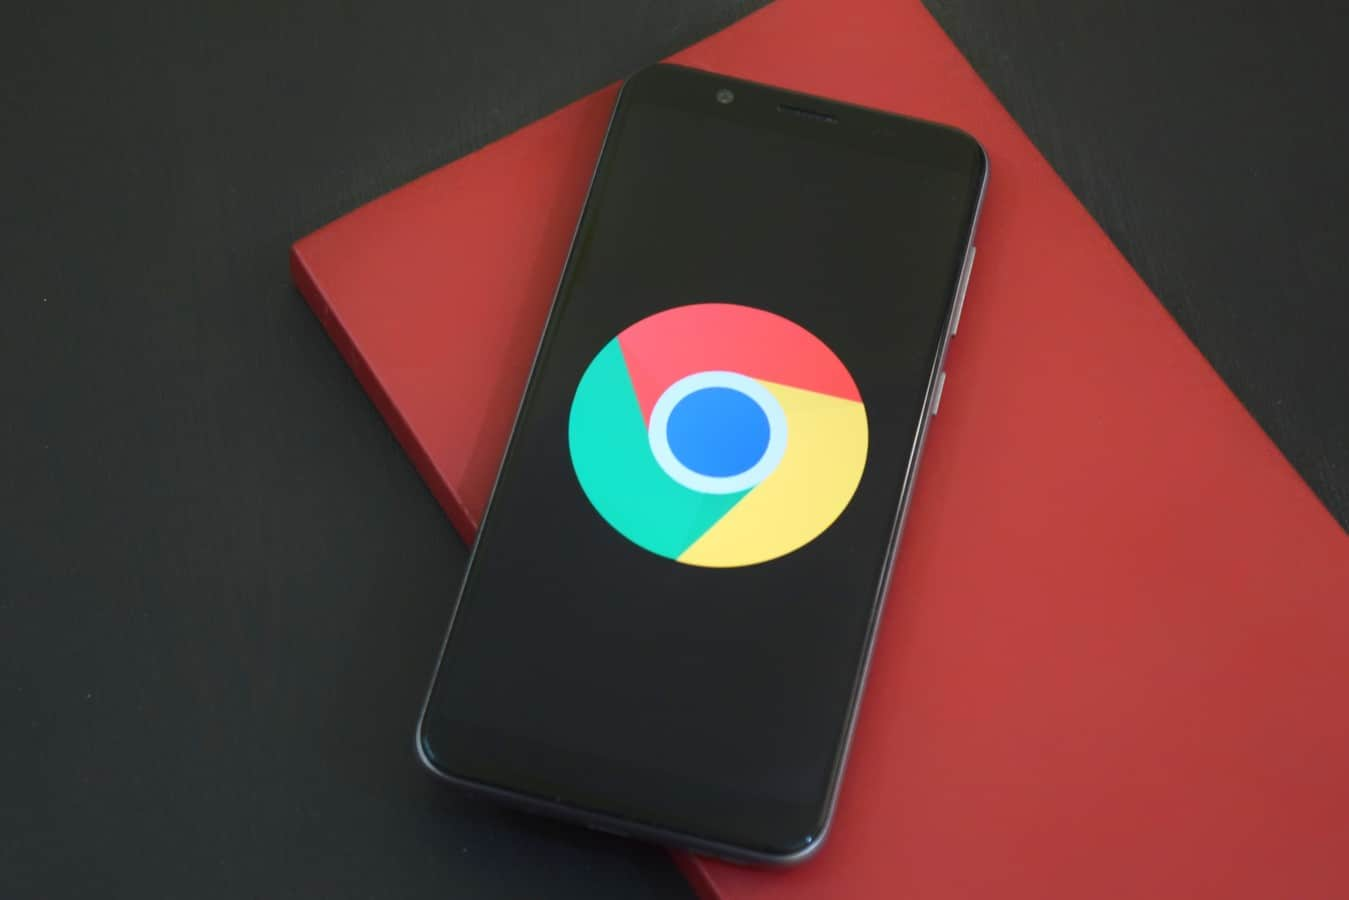 Smartphone with Chrome logo